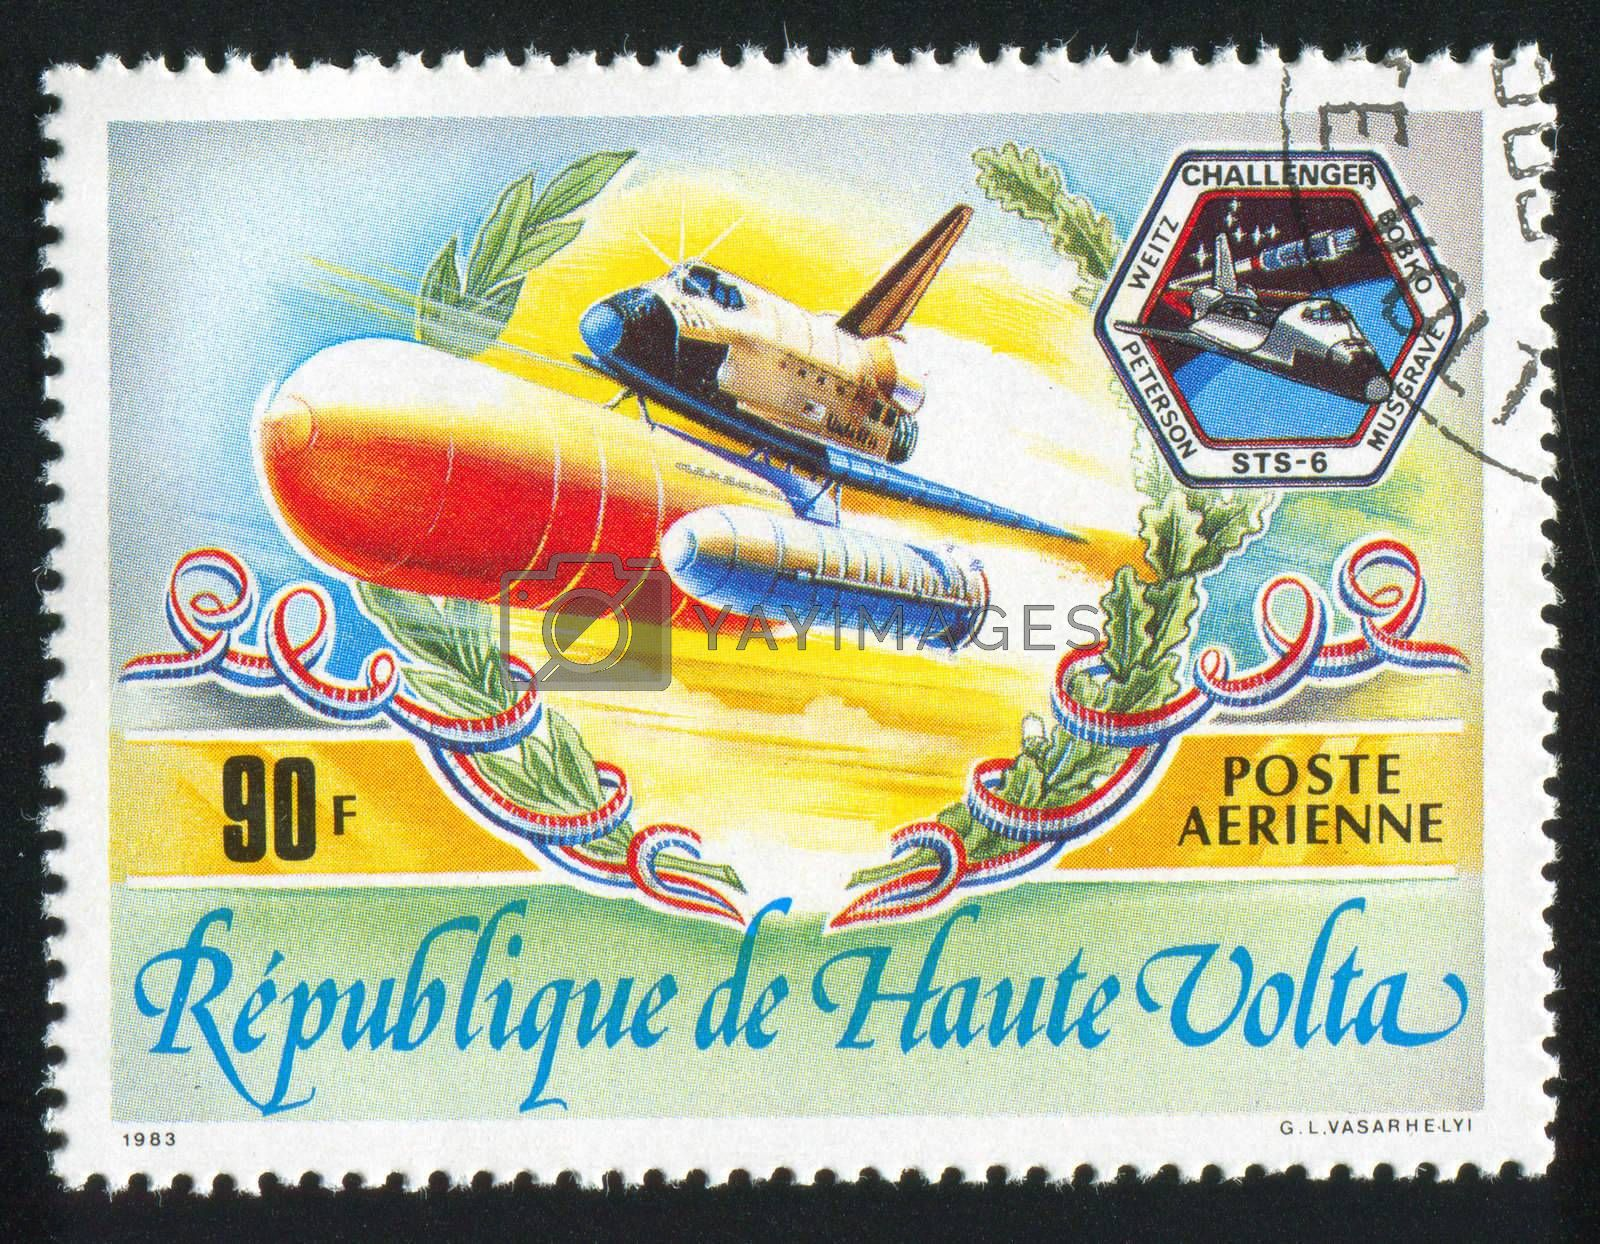 BURKINA FASO - CIRCA 1983: stamp printed by Burkina Faso, shows rocket, circa 1983.